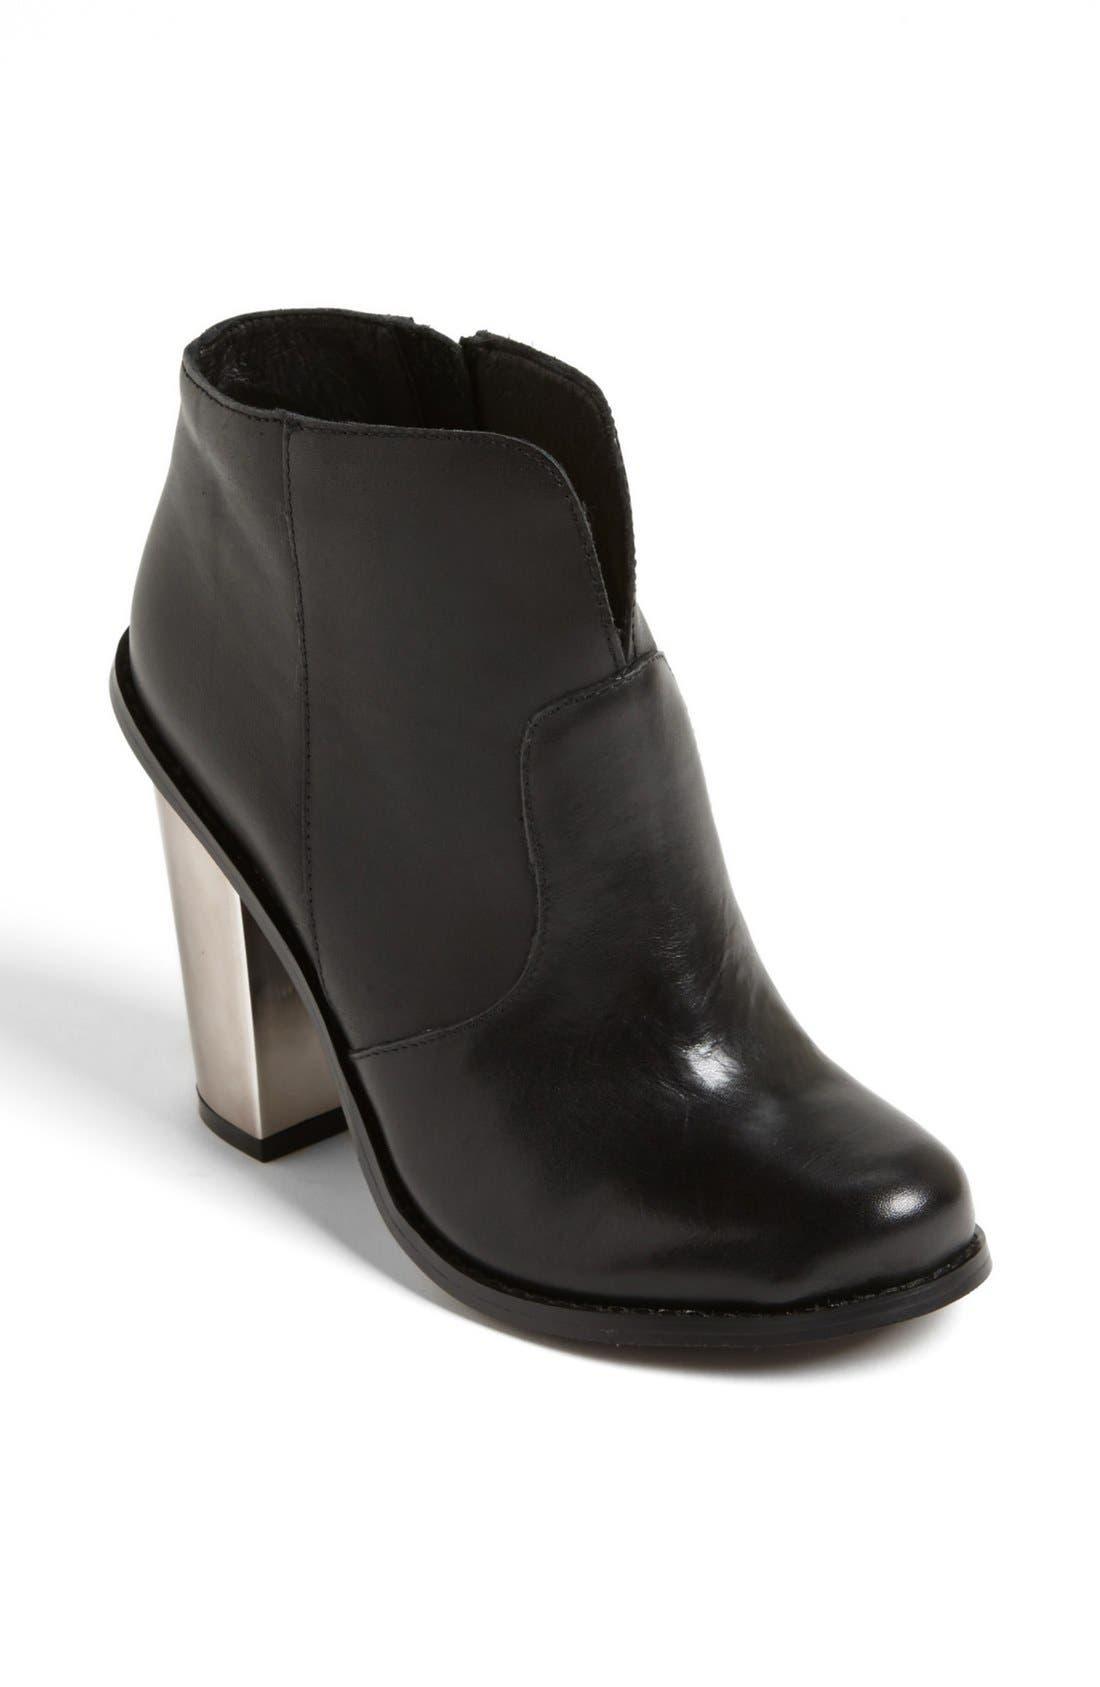 Alternate Image 1 Selected - Kristin Cavallari 'Raylin' Boot